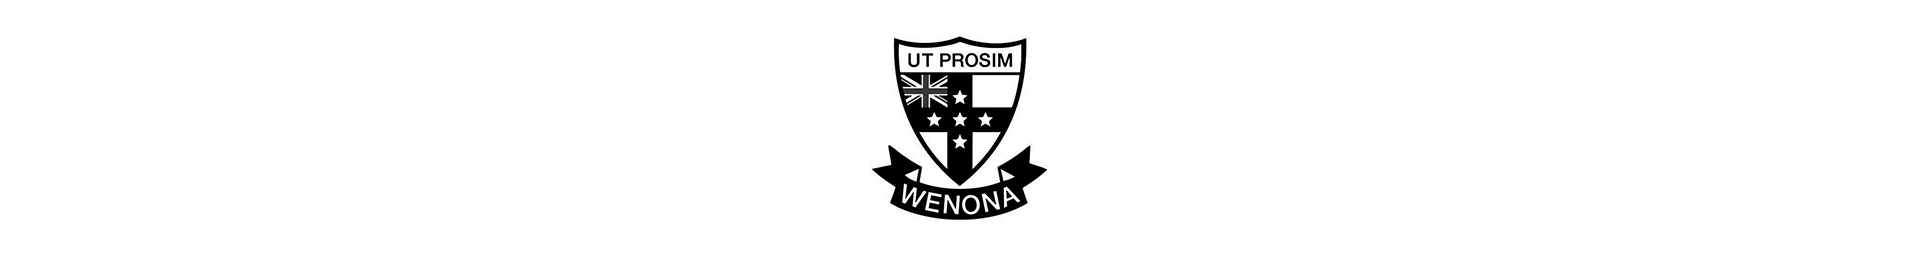 Logos_Wenona.jpg